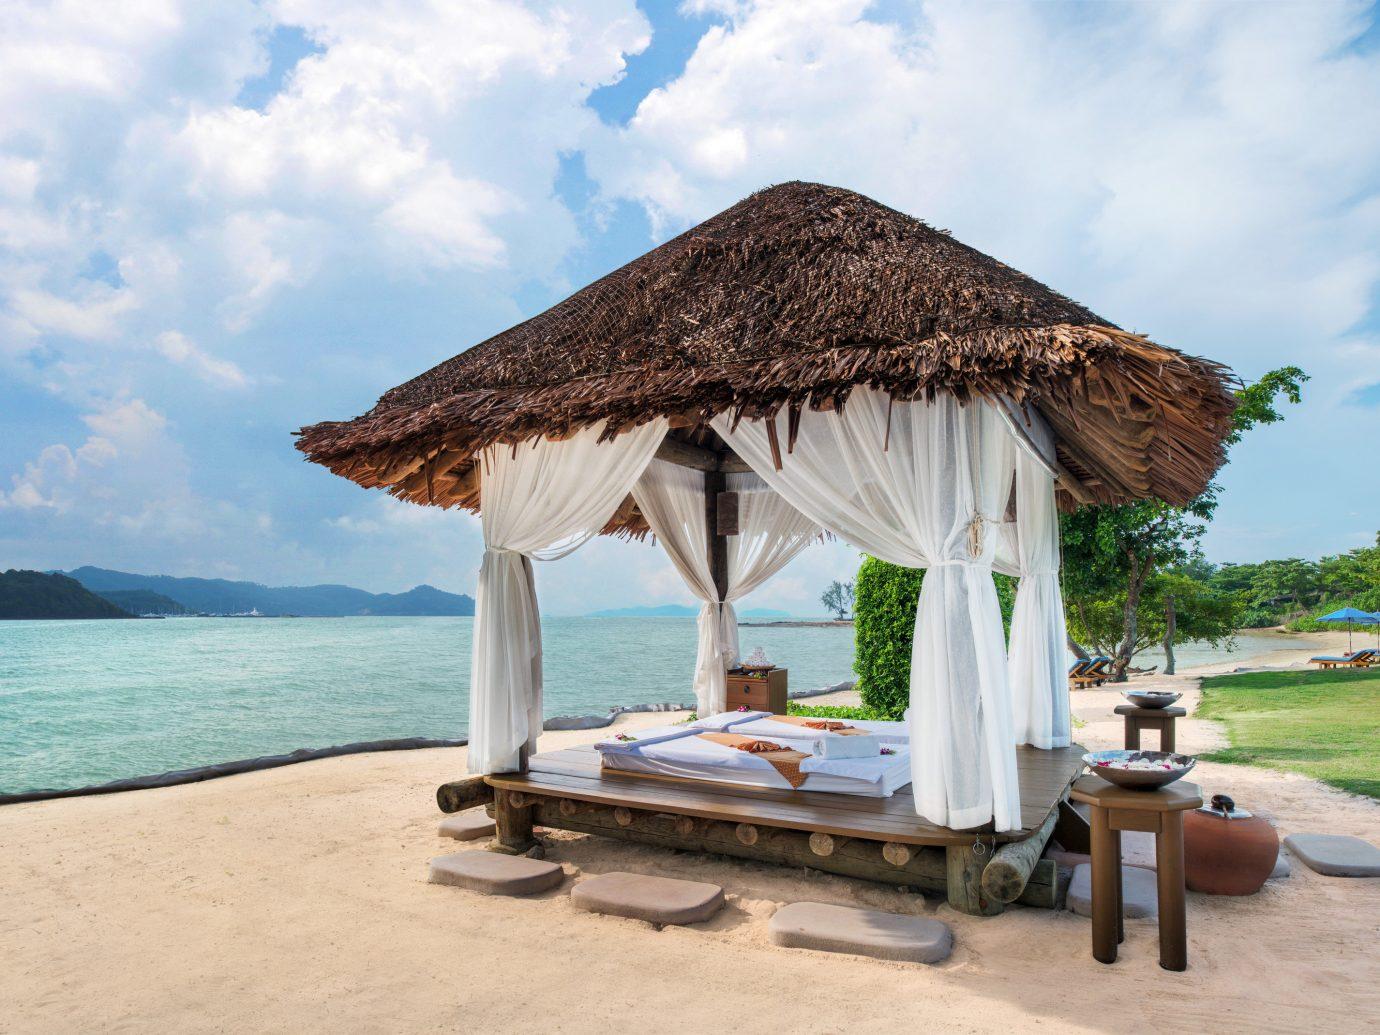 Hotels Phuket Thailand Resort vacation sky gazebo Sea Beach outdoor structure tourism leisure tropics caribbean estate hut